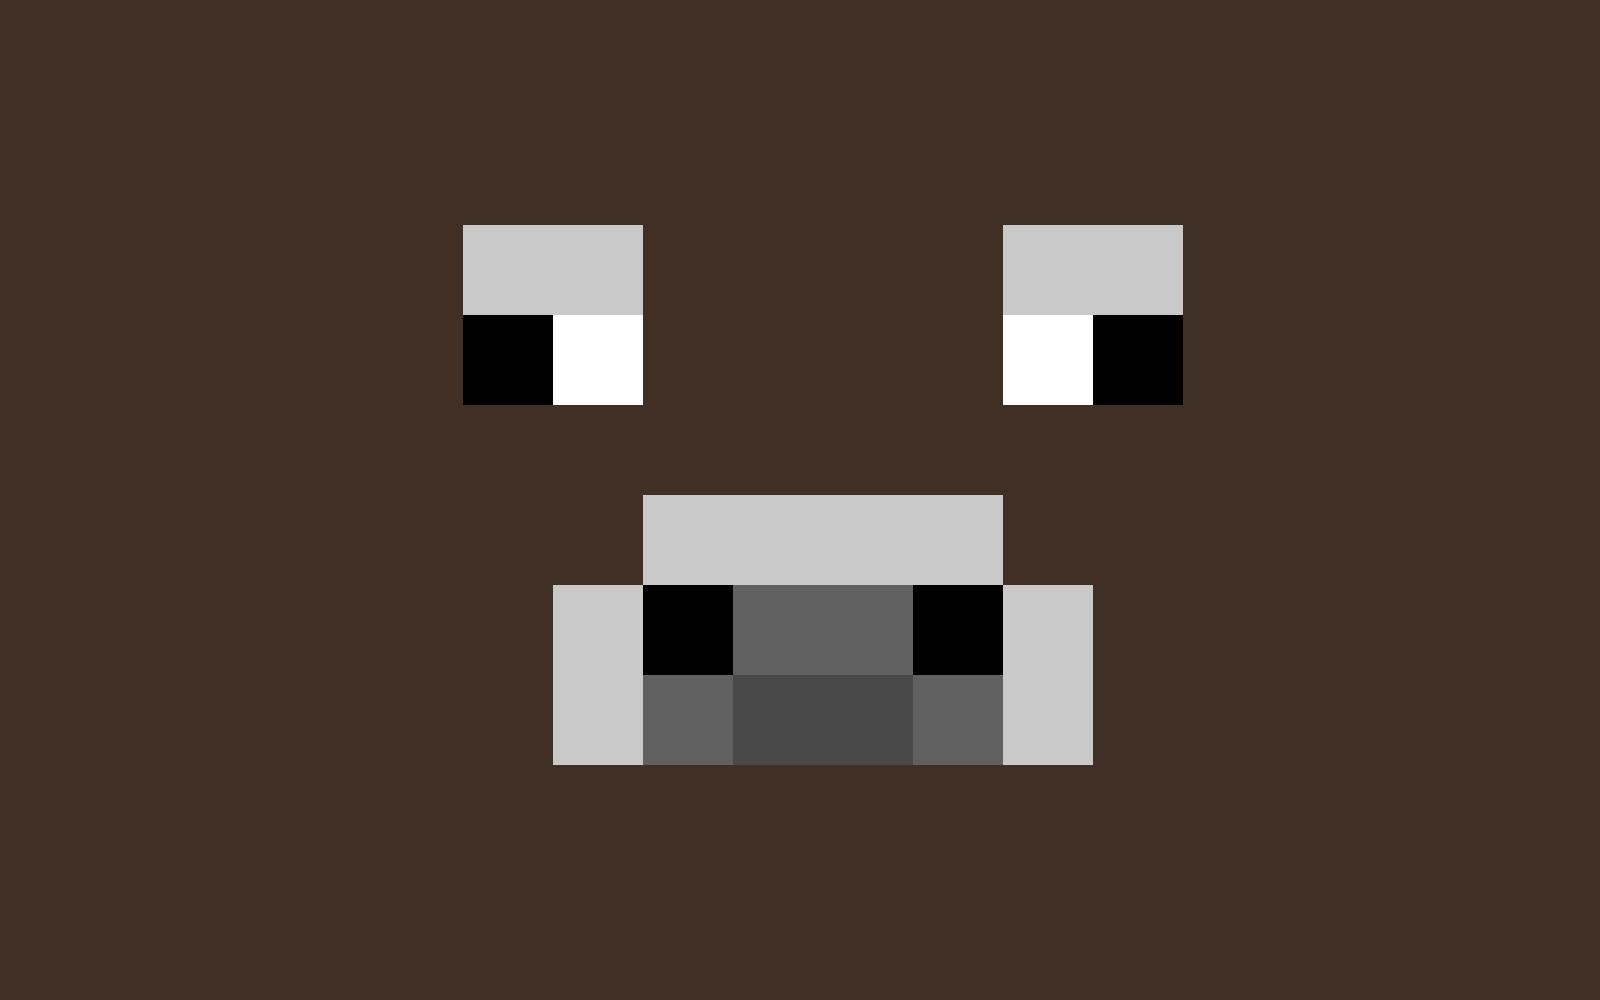 Minecraft Cow Skin Template | www.pixshark.com - Images ...